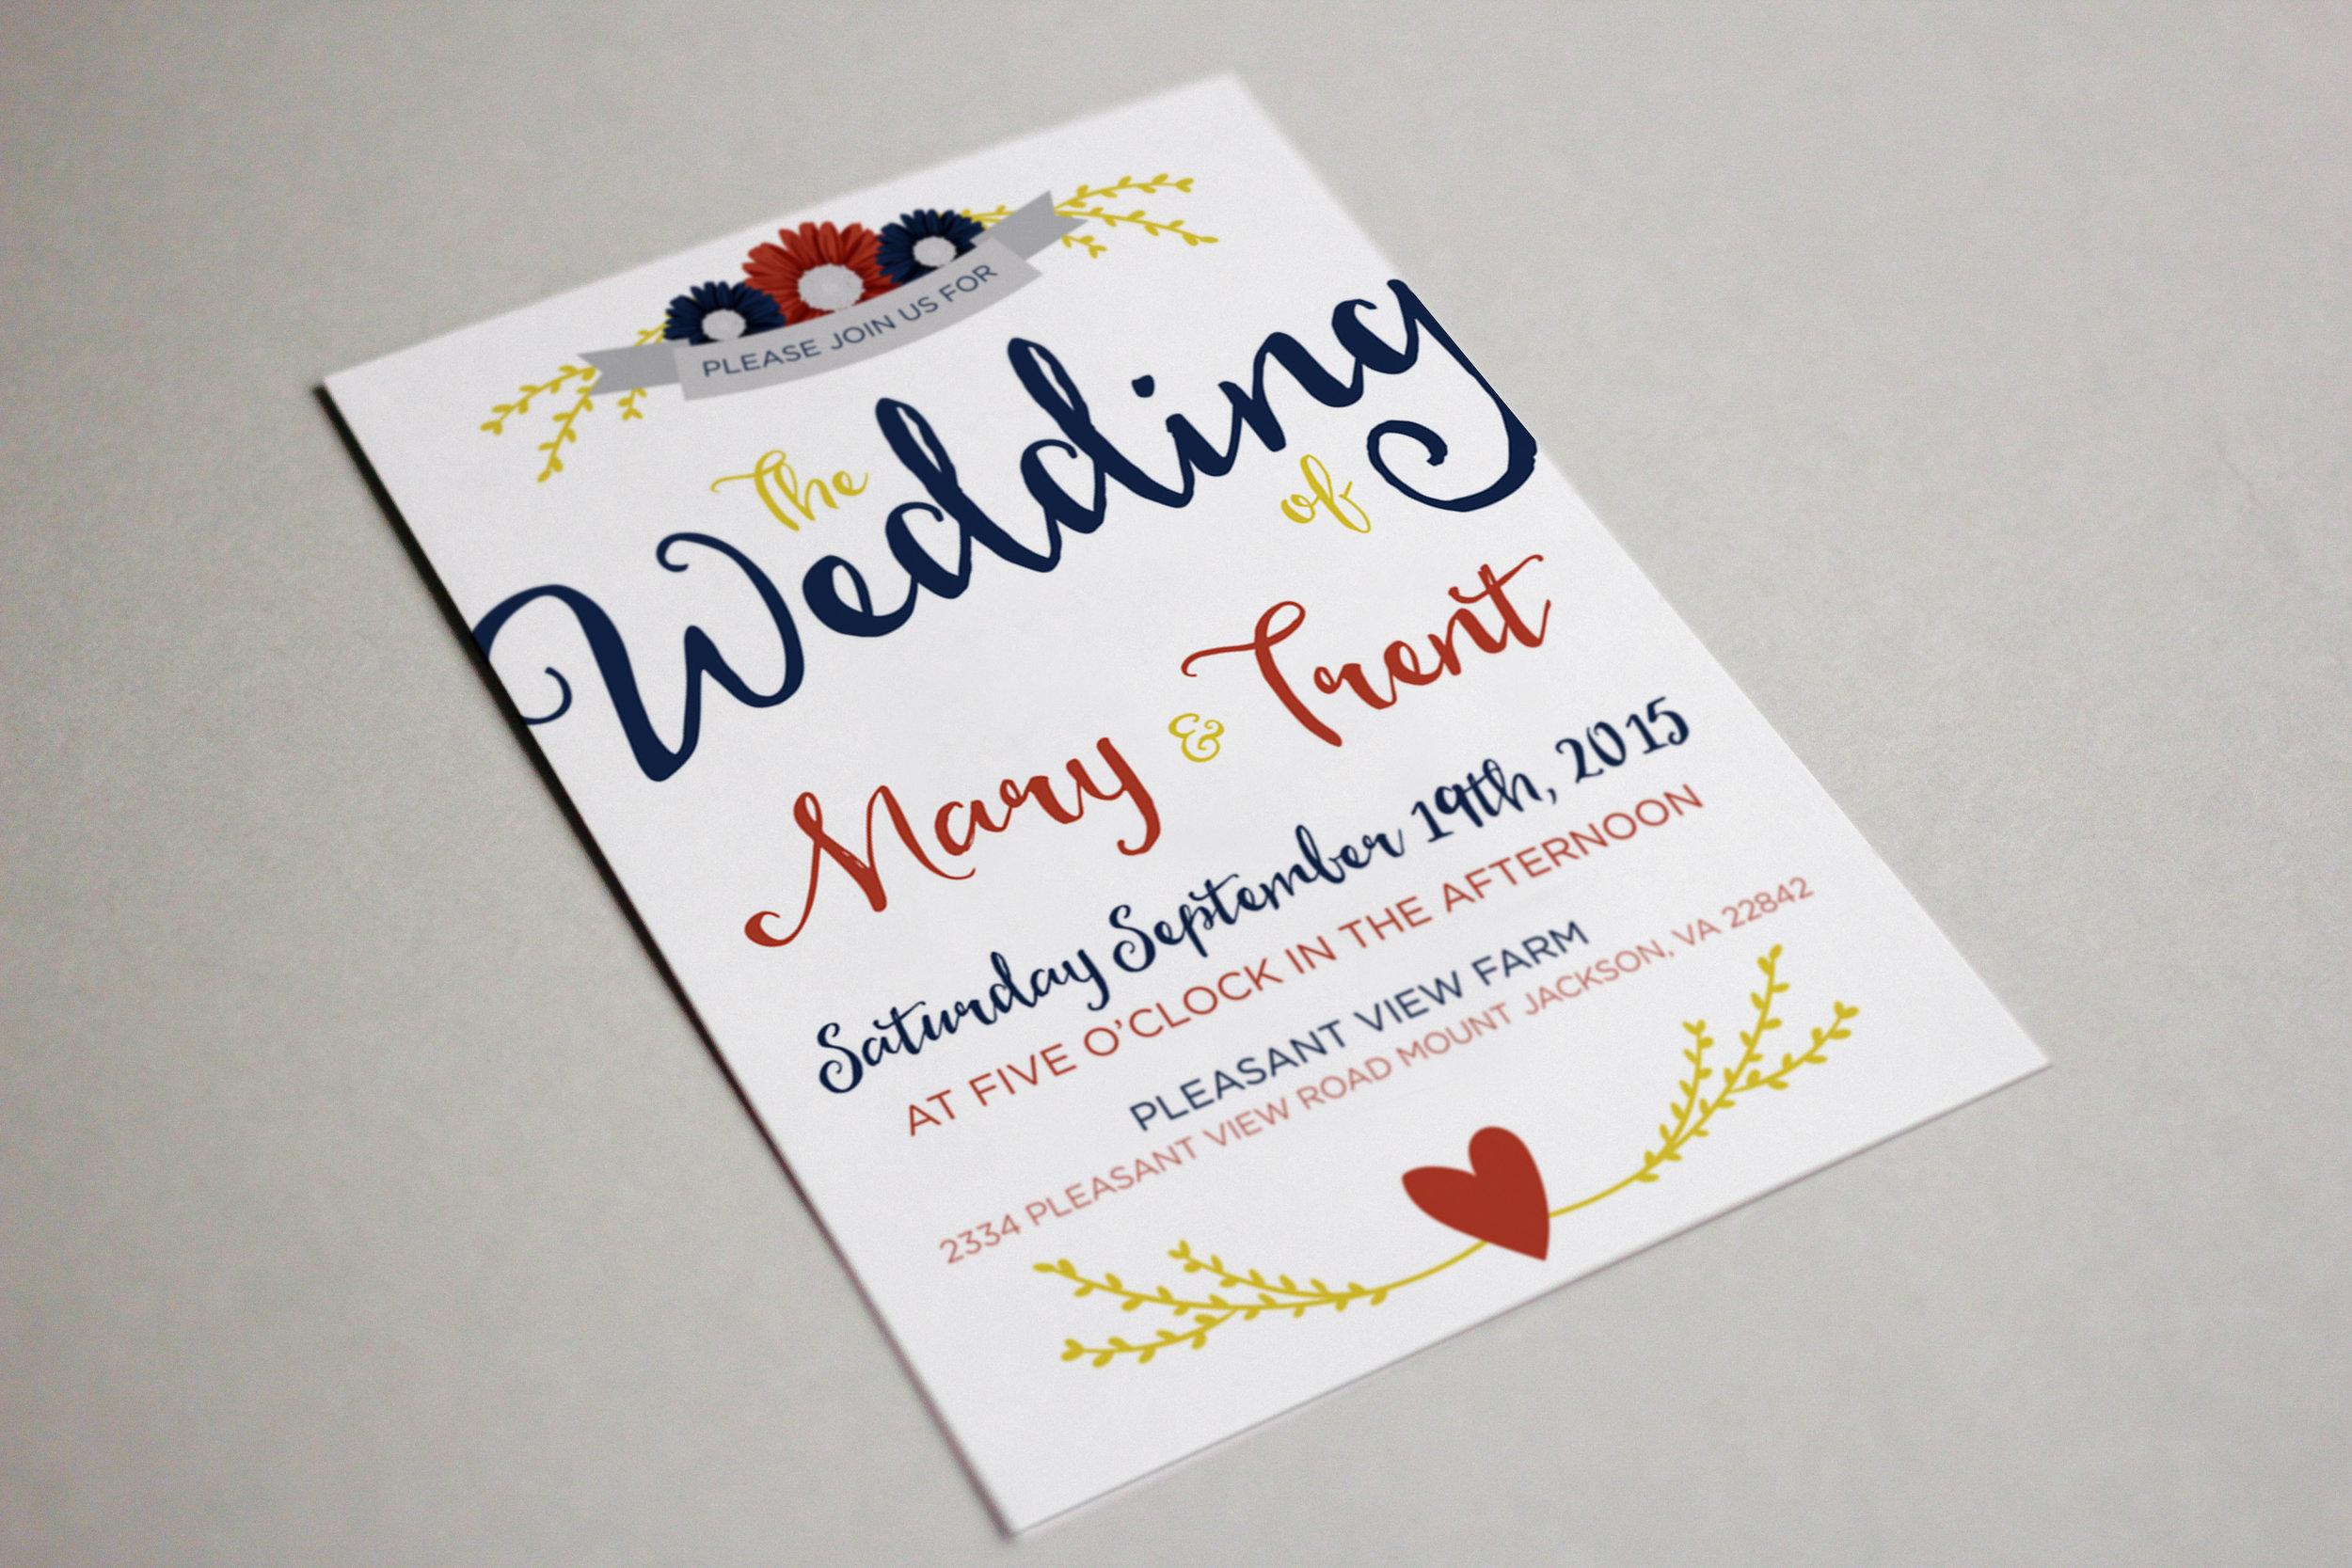 mary_wedding.jpg